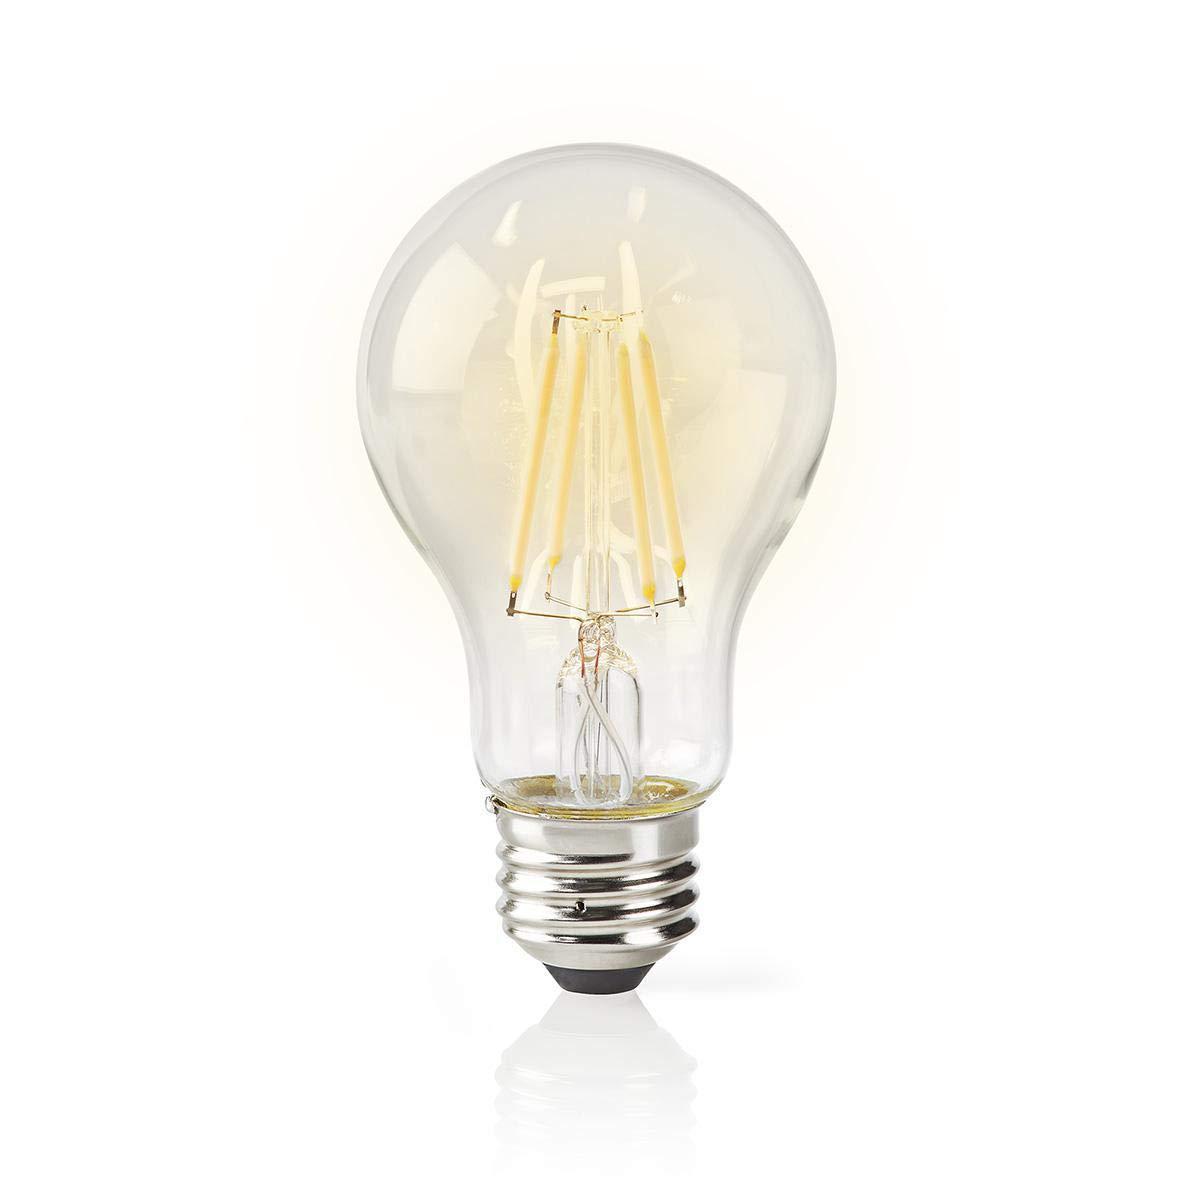 TronicXL Dimmbare WiFi WLAN Lampe Filament Gl/ühbirne Retro Design warmwei/ß kaltwei/ß LED Leuchtmittel Smart Gl/ühlampe E27 f/ür amazon Alexa Google Home Zubeh/ör G125 Vintage gro/ß dimmbar gedreht